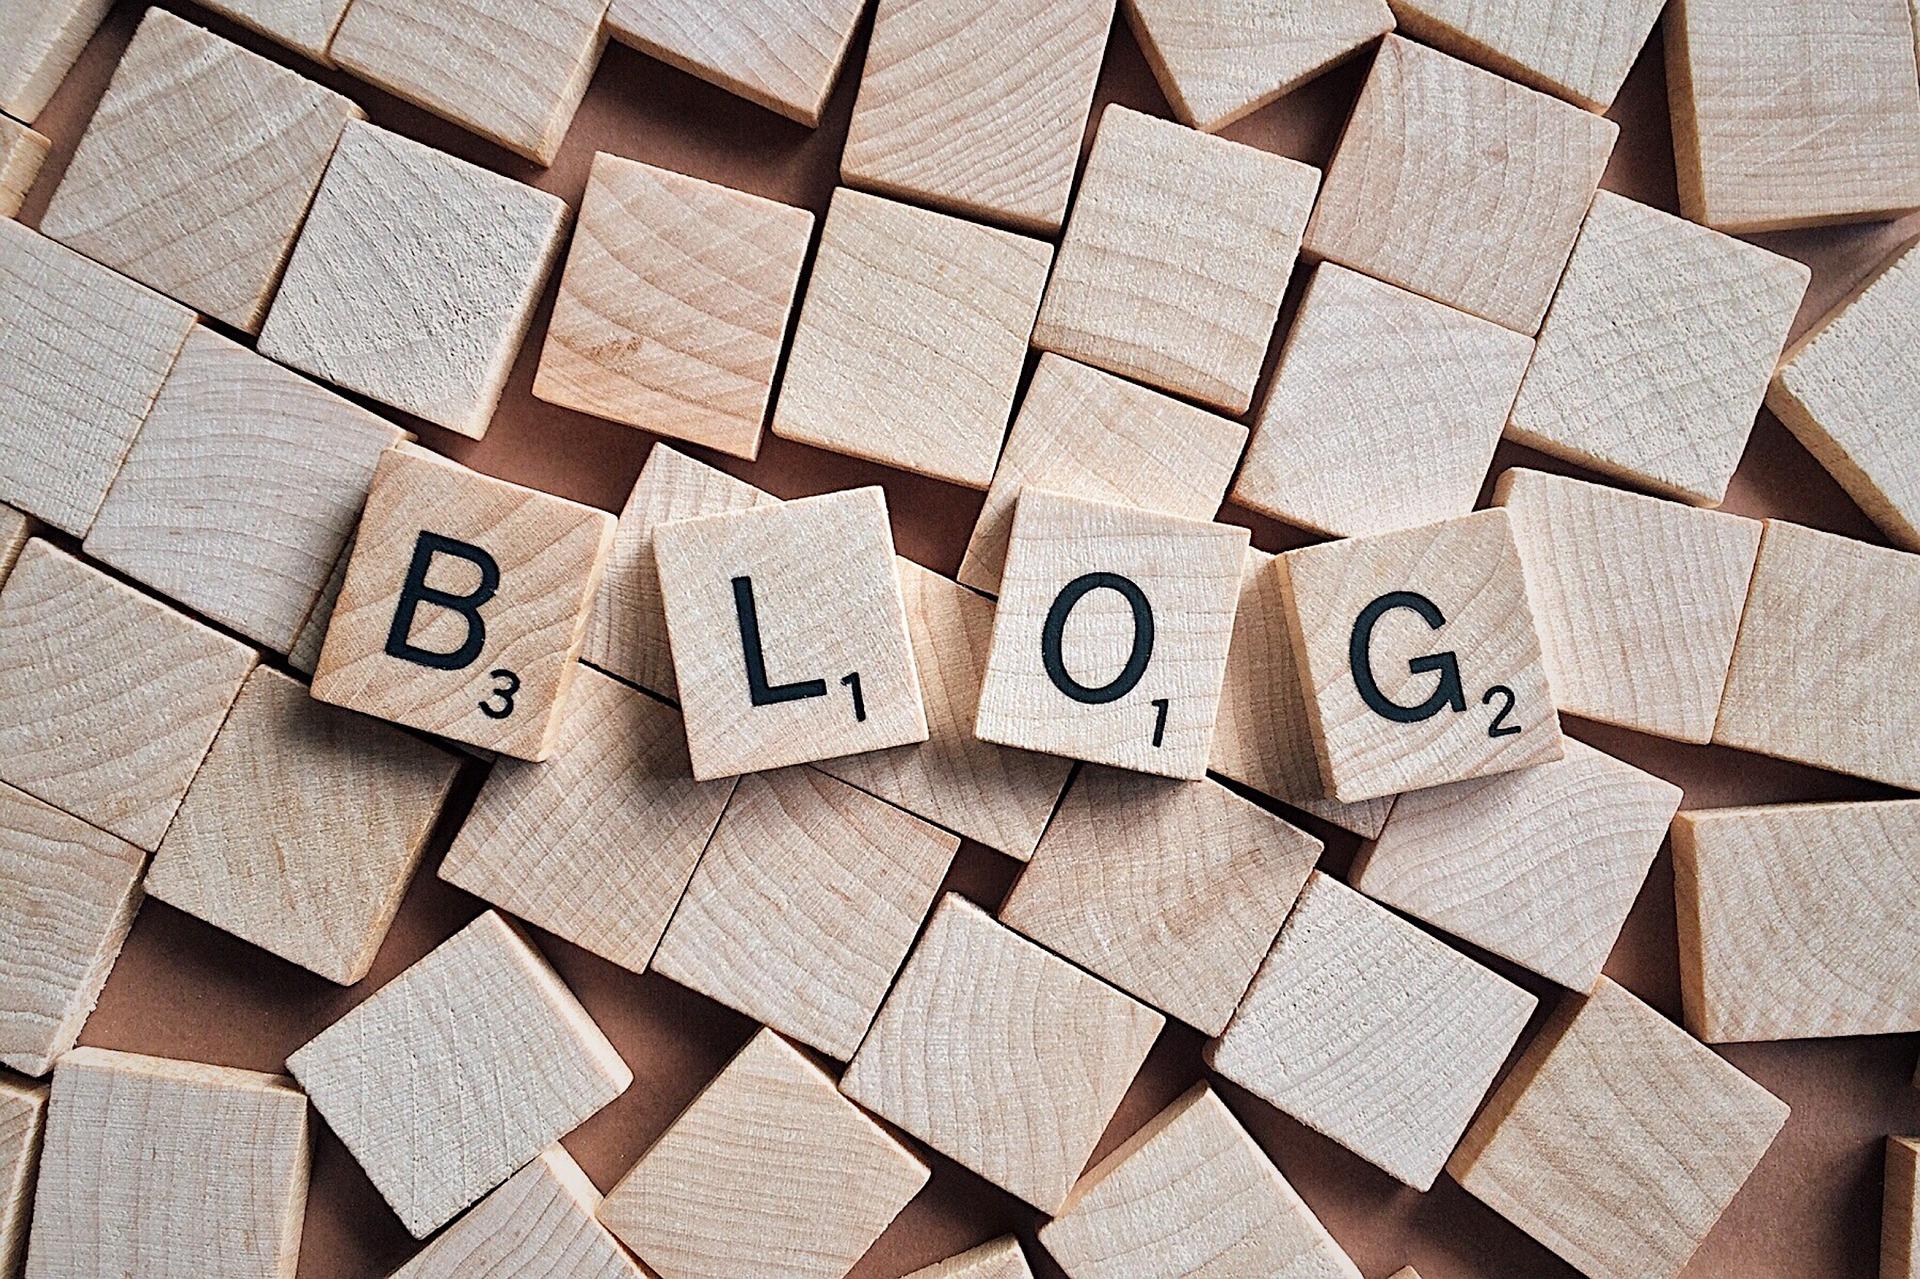 blog 2355684 1920 - WordPressのカスタマイズでオススメ本4つと簡単なやり方まとめ